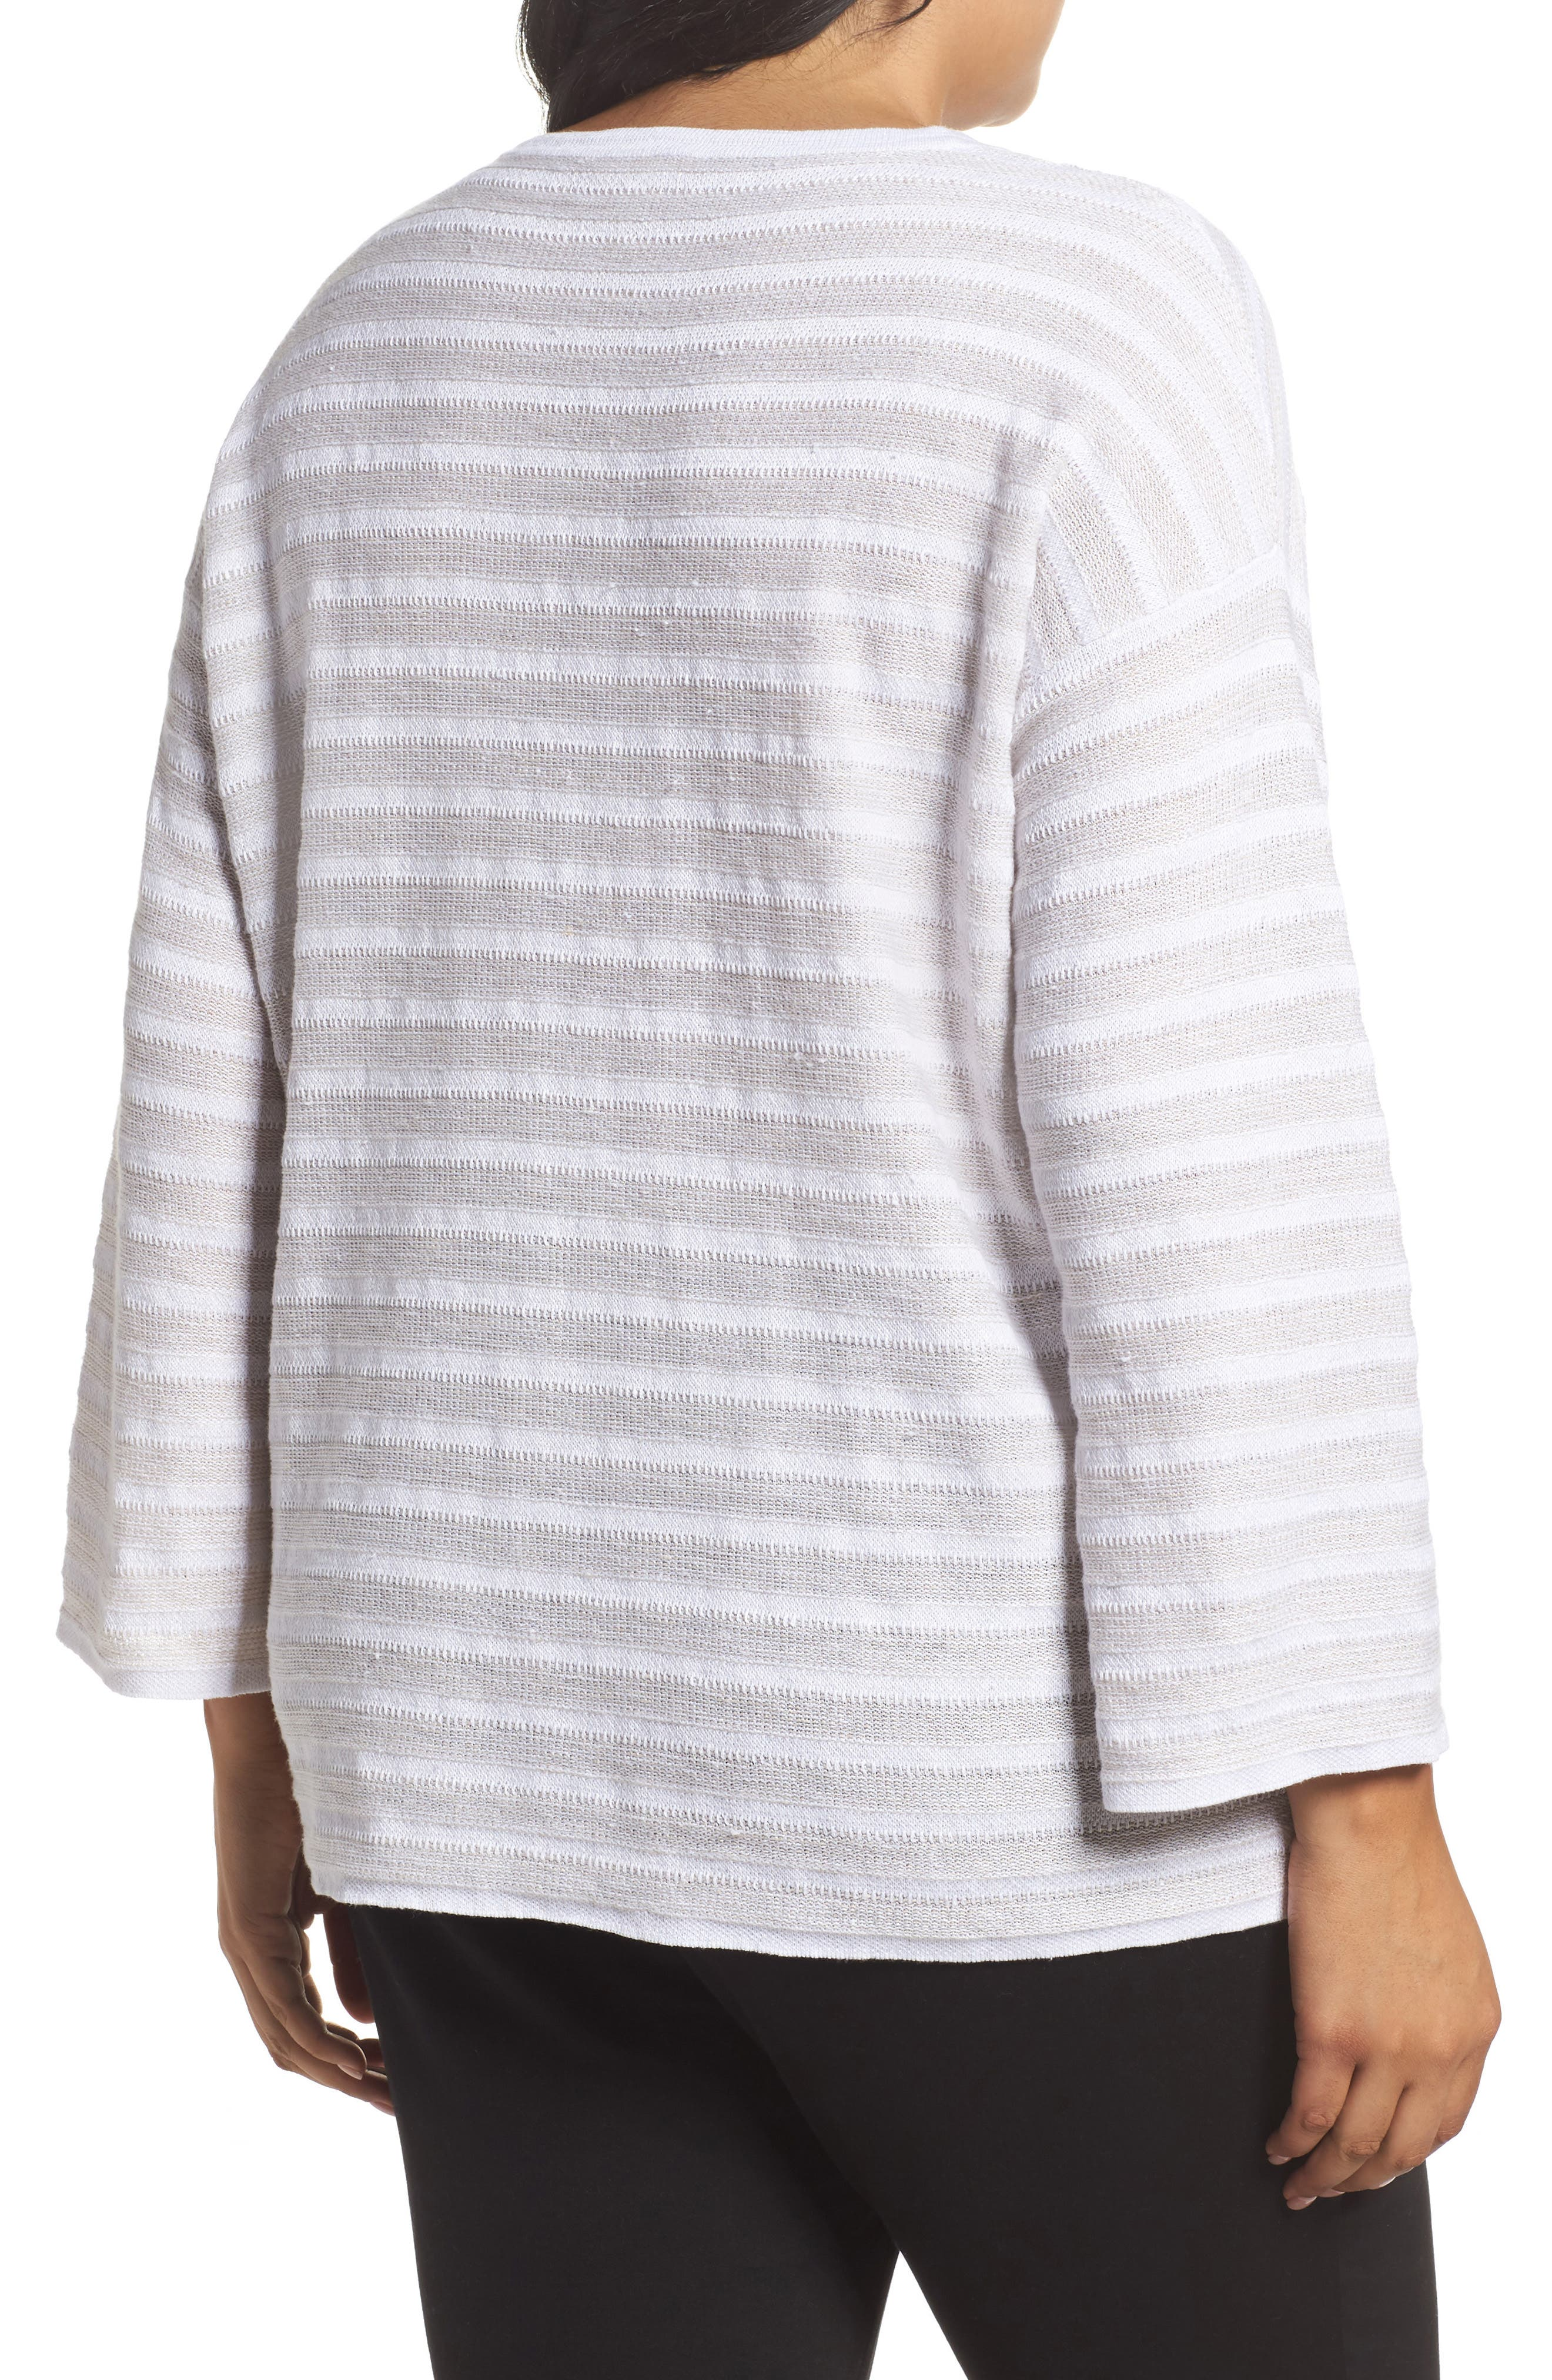 Textured Organic Linen Sweater,                             Alternate thumbnail 2, color,